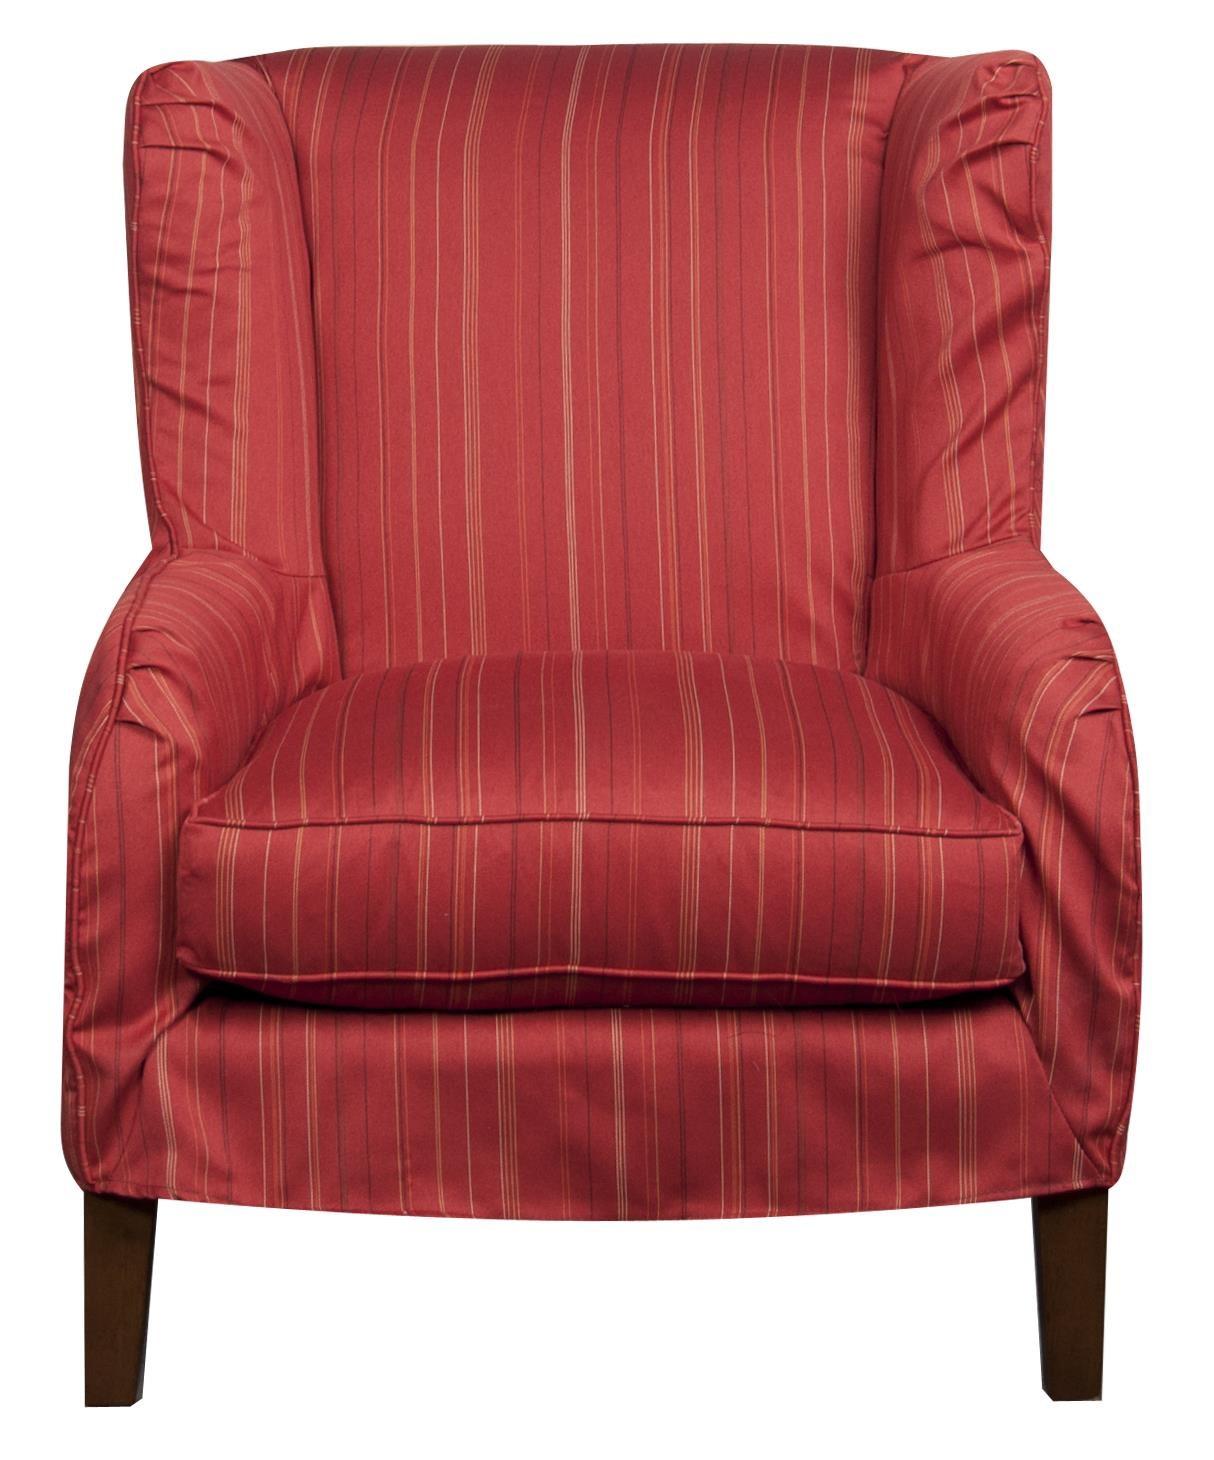 Elliston Place Jordan - Jordan Accent Chair - Item Number: 944460010